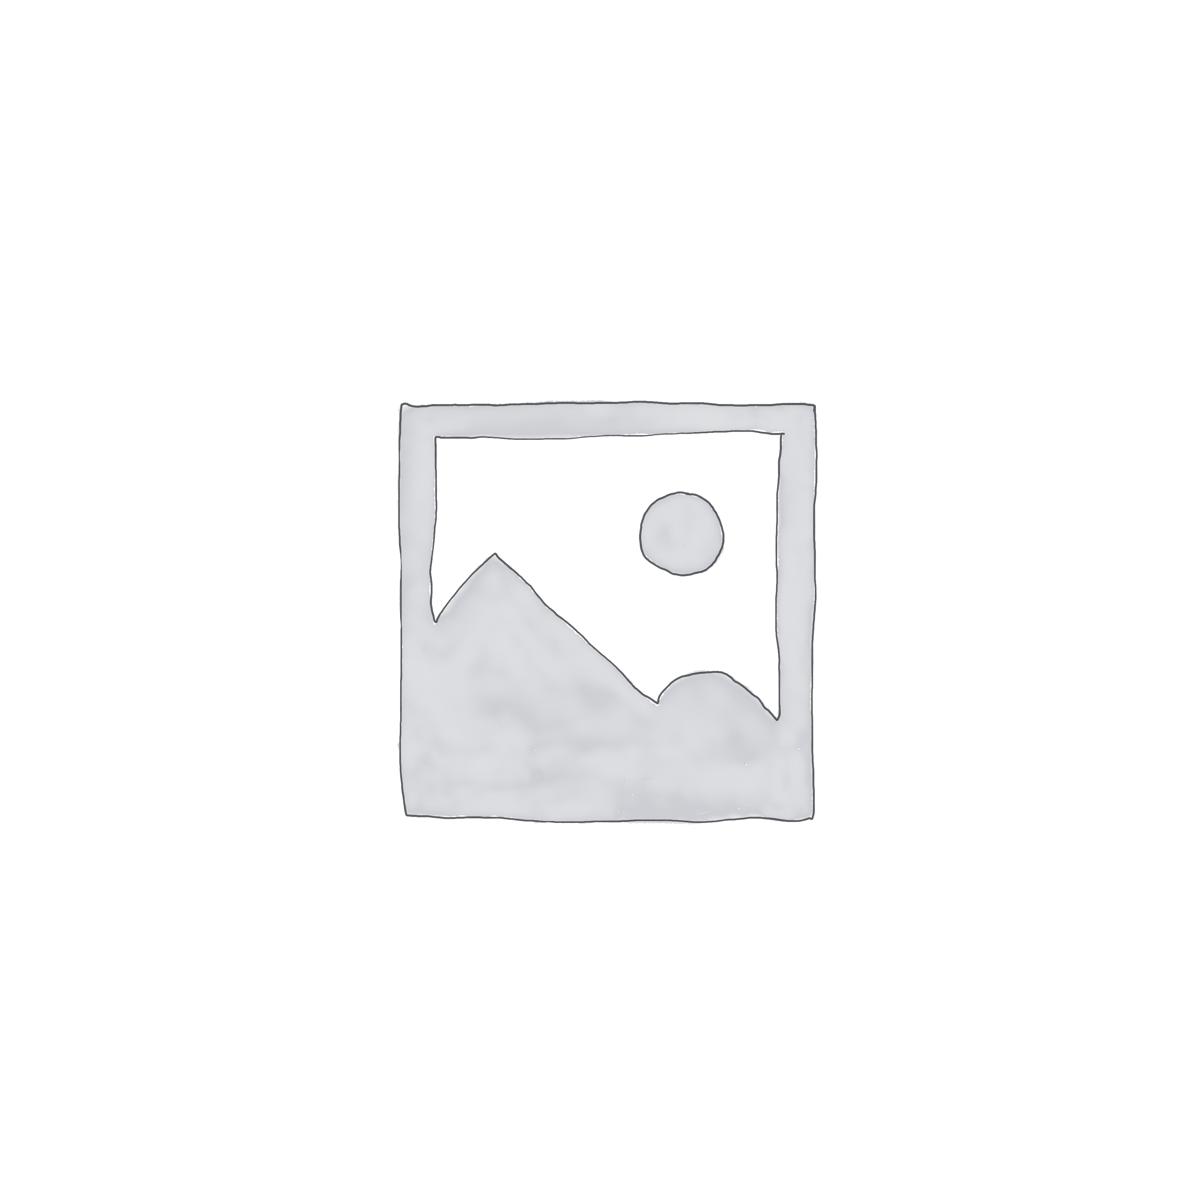 woocommerce-placeholder